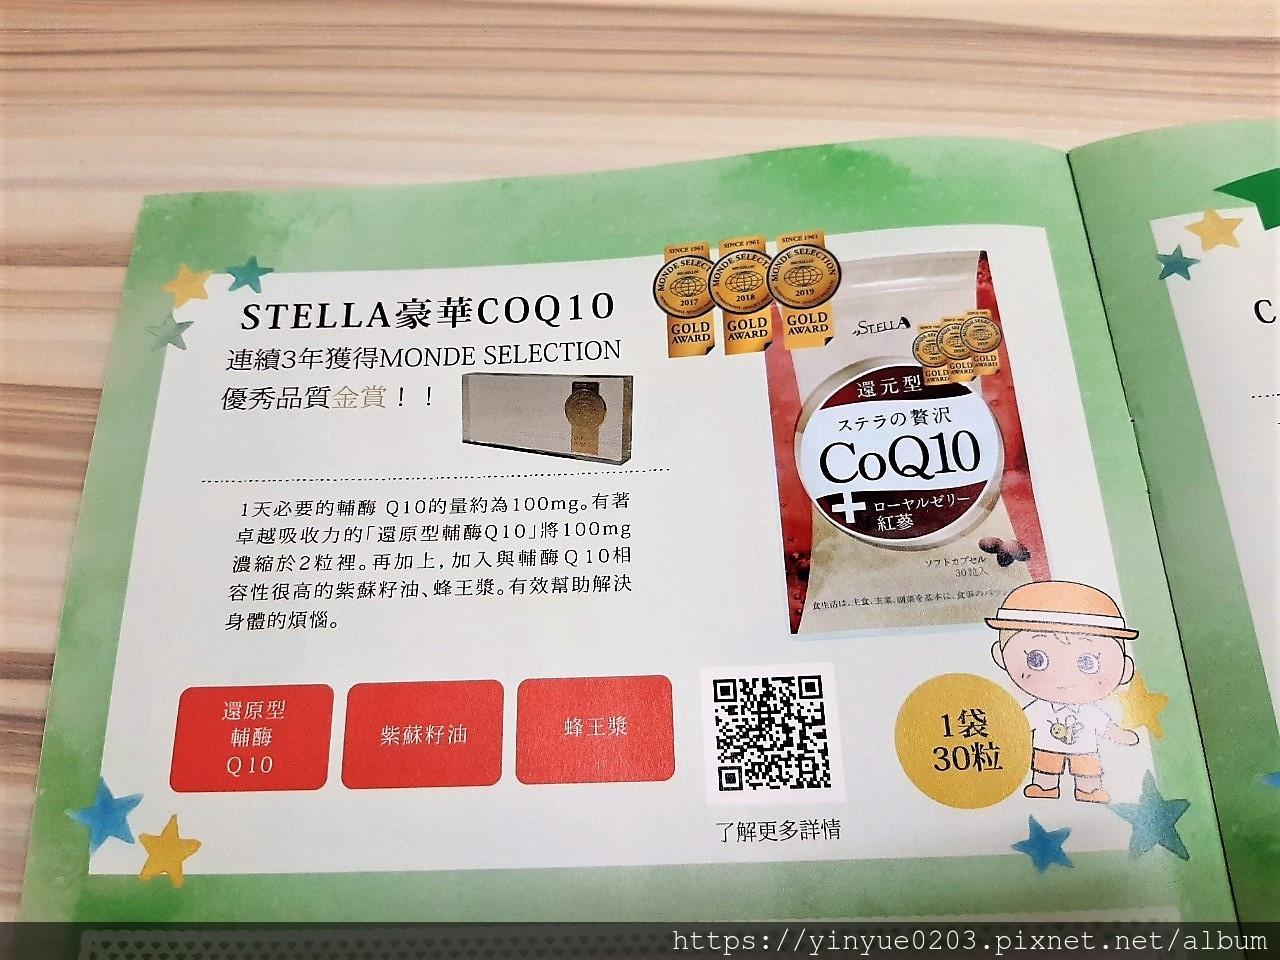 STELLA豪華COQ10